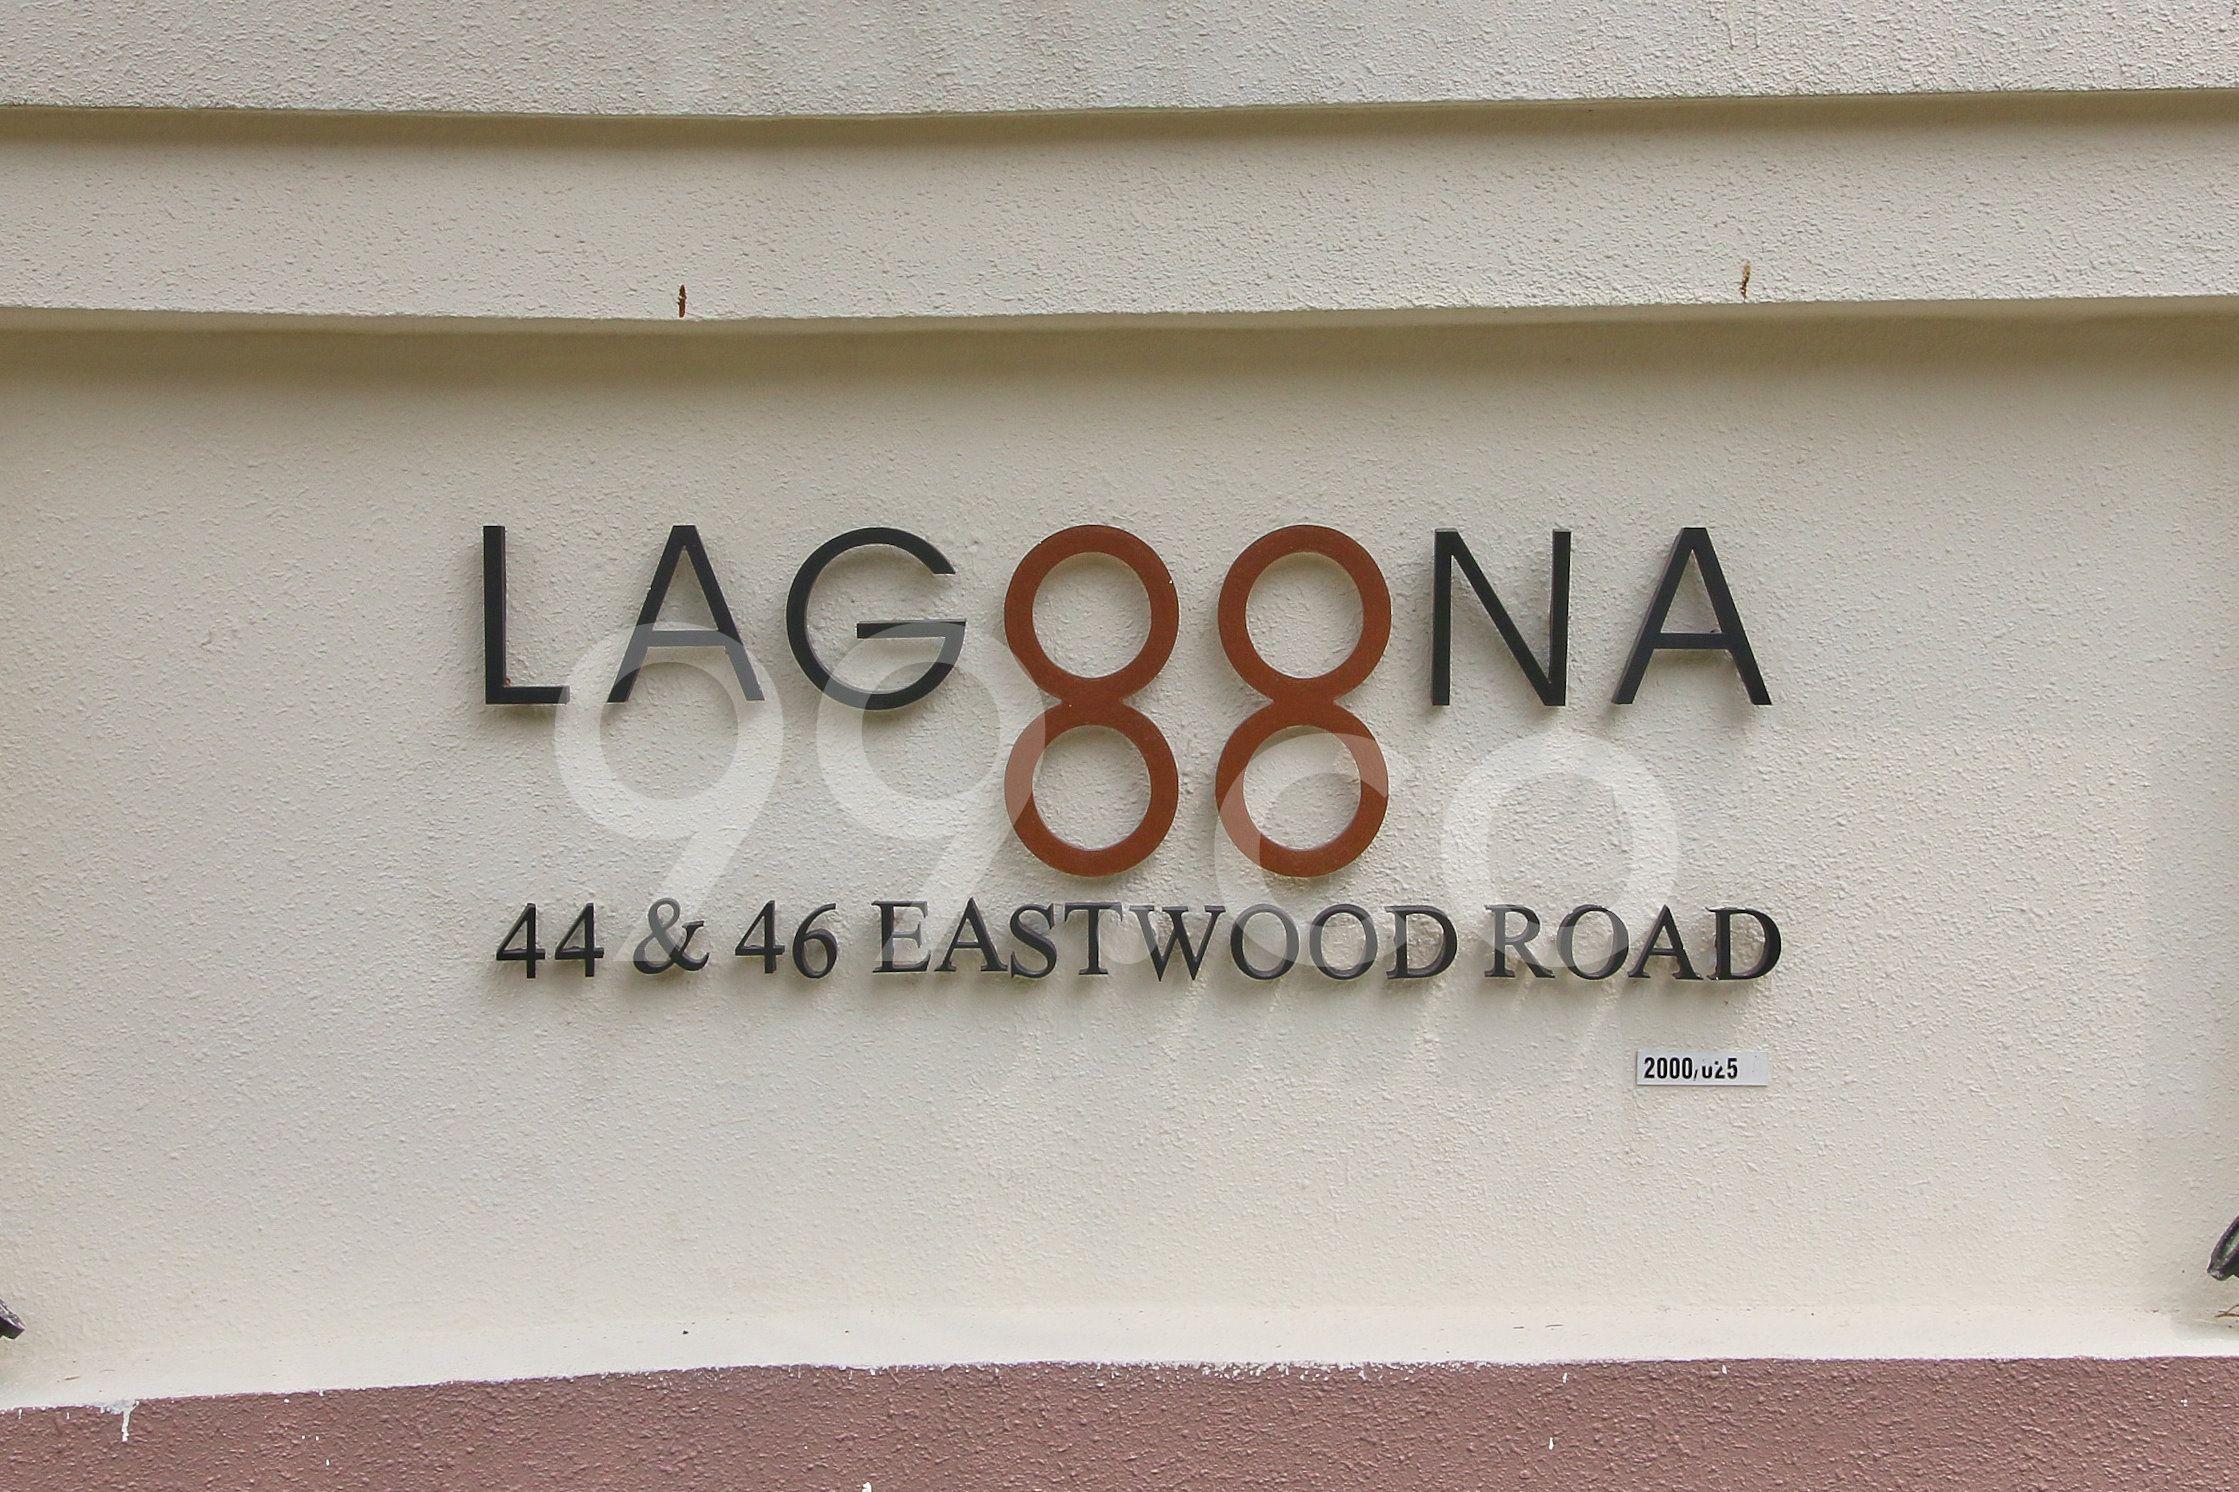 Laguna 88 Laguna 88 - Logo